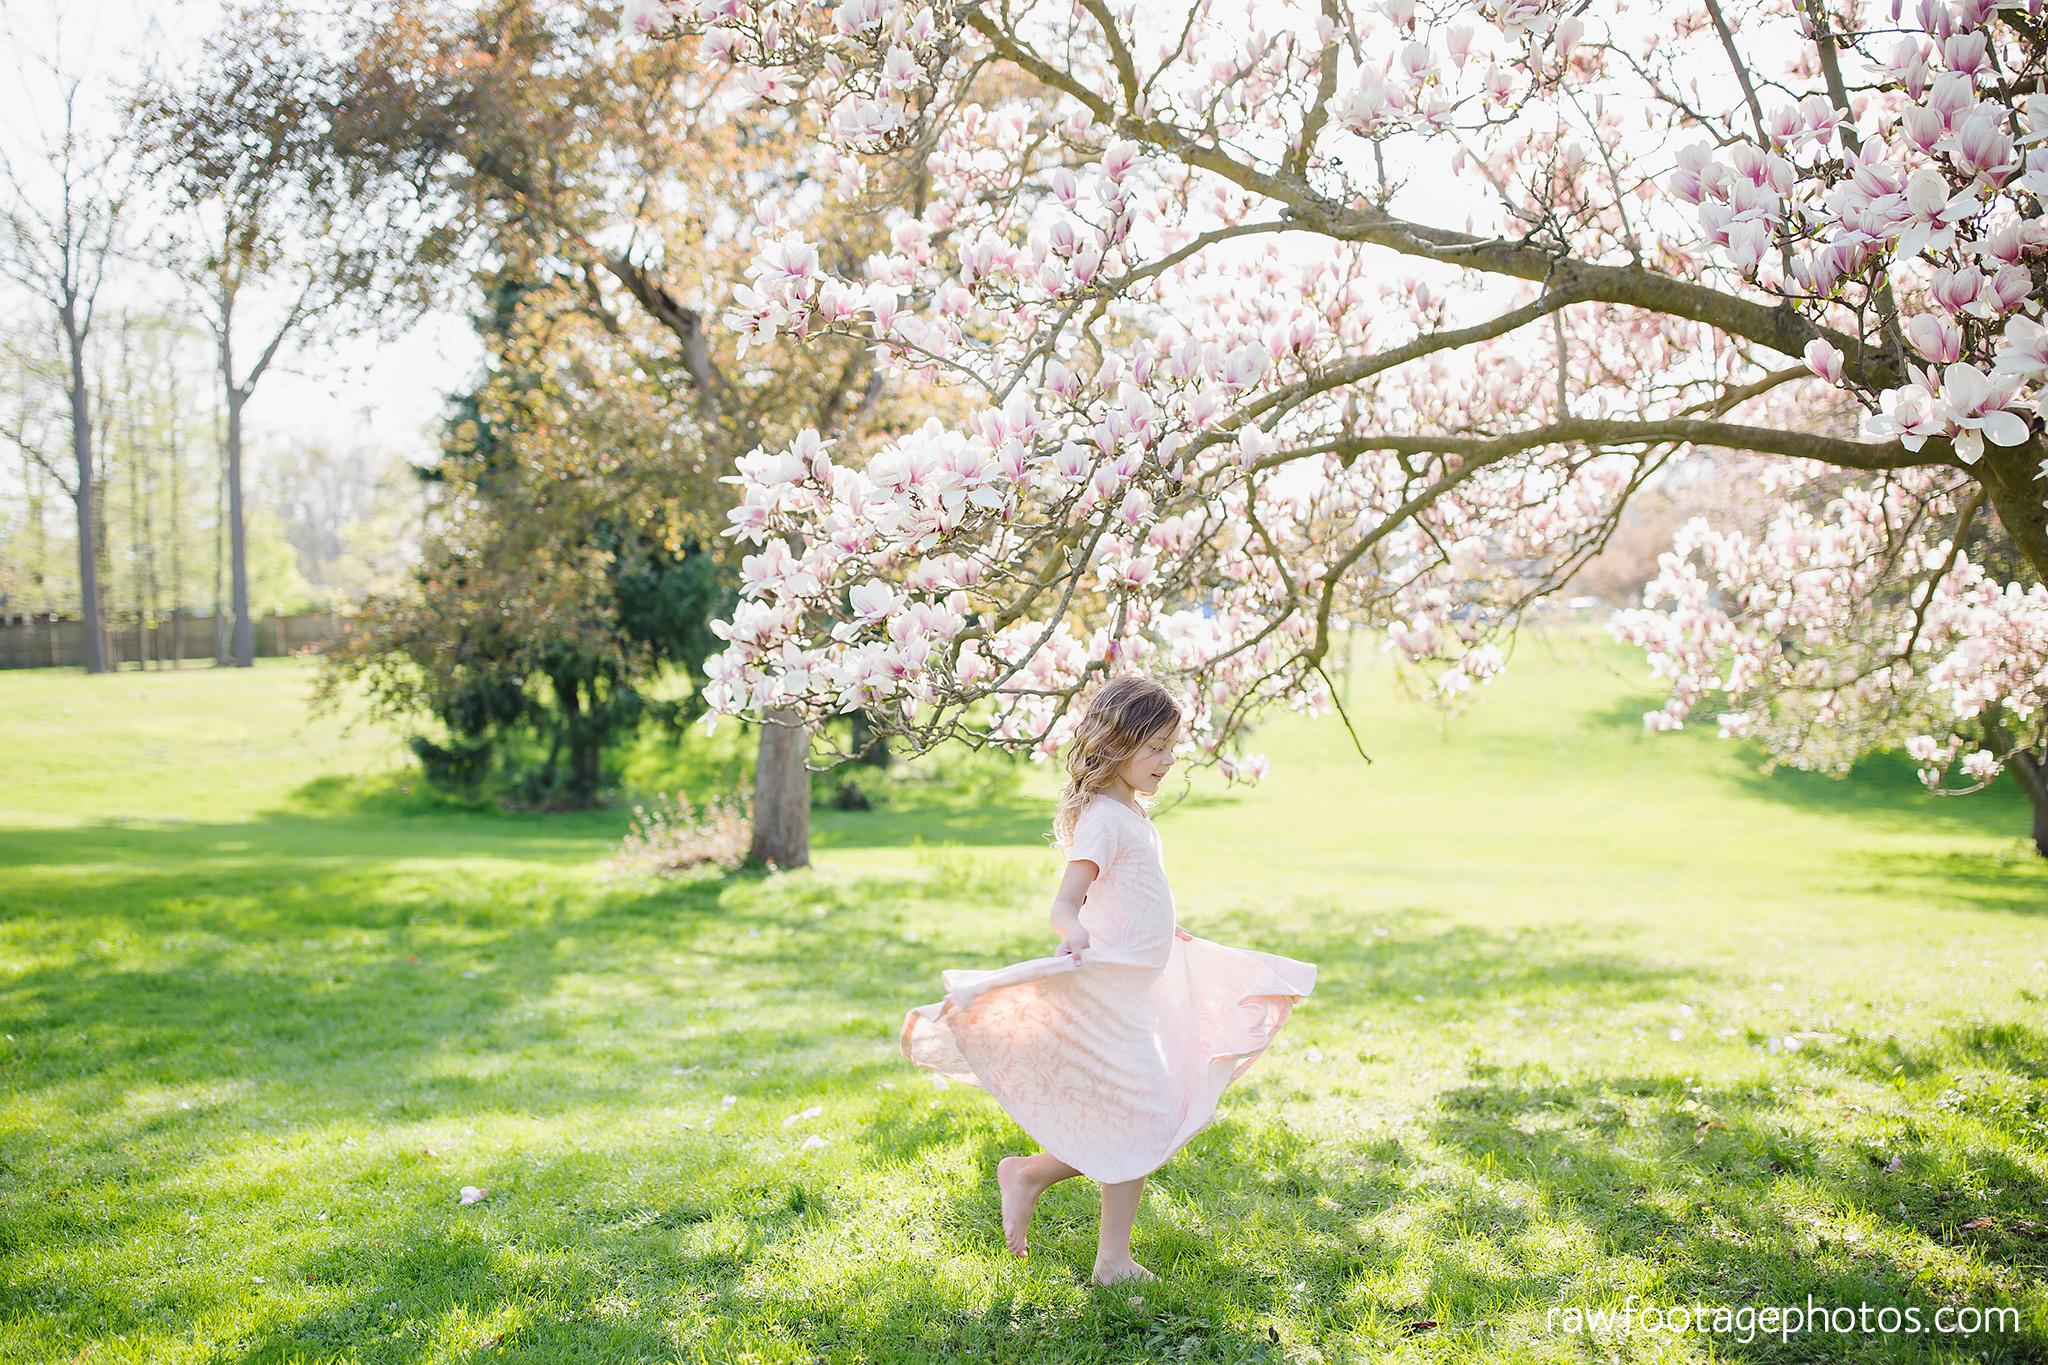 london_ontario_family_photographer-raw_footage_photography-spring_blossom_mini_sessions-magnolia-springbank_park017.jpg